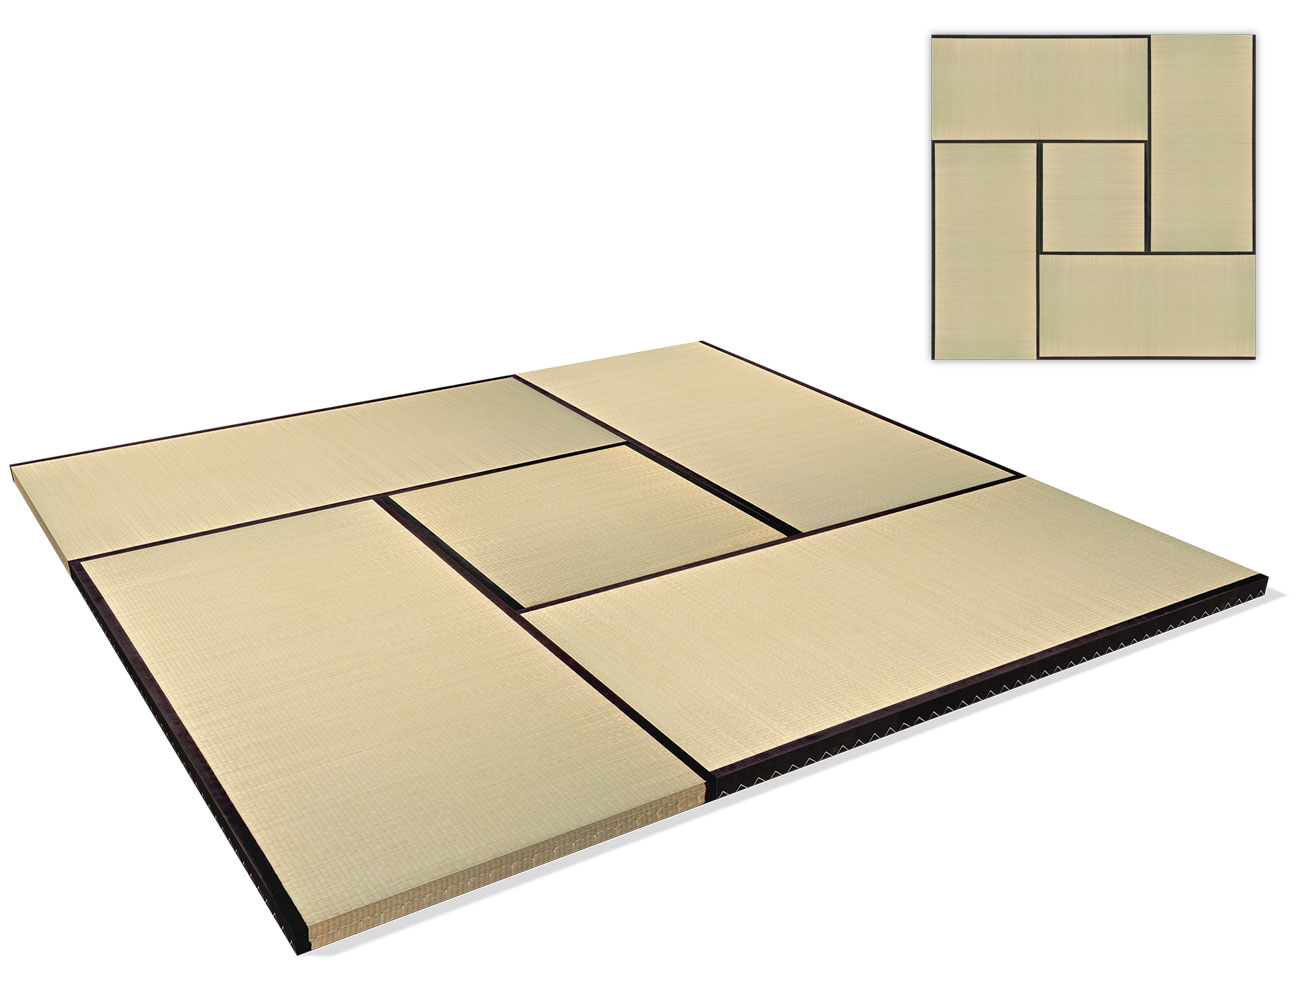 Full Size of Tatami Bett High Quality Set 270x270 Cm Kaufen Edofutonde Rauch Betten 120 X 200 160x200 Halbhohes Hohes Kleinkind Mit Stauraum 140x200 Poco Kingsize Bett Tatami Bett